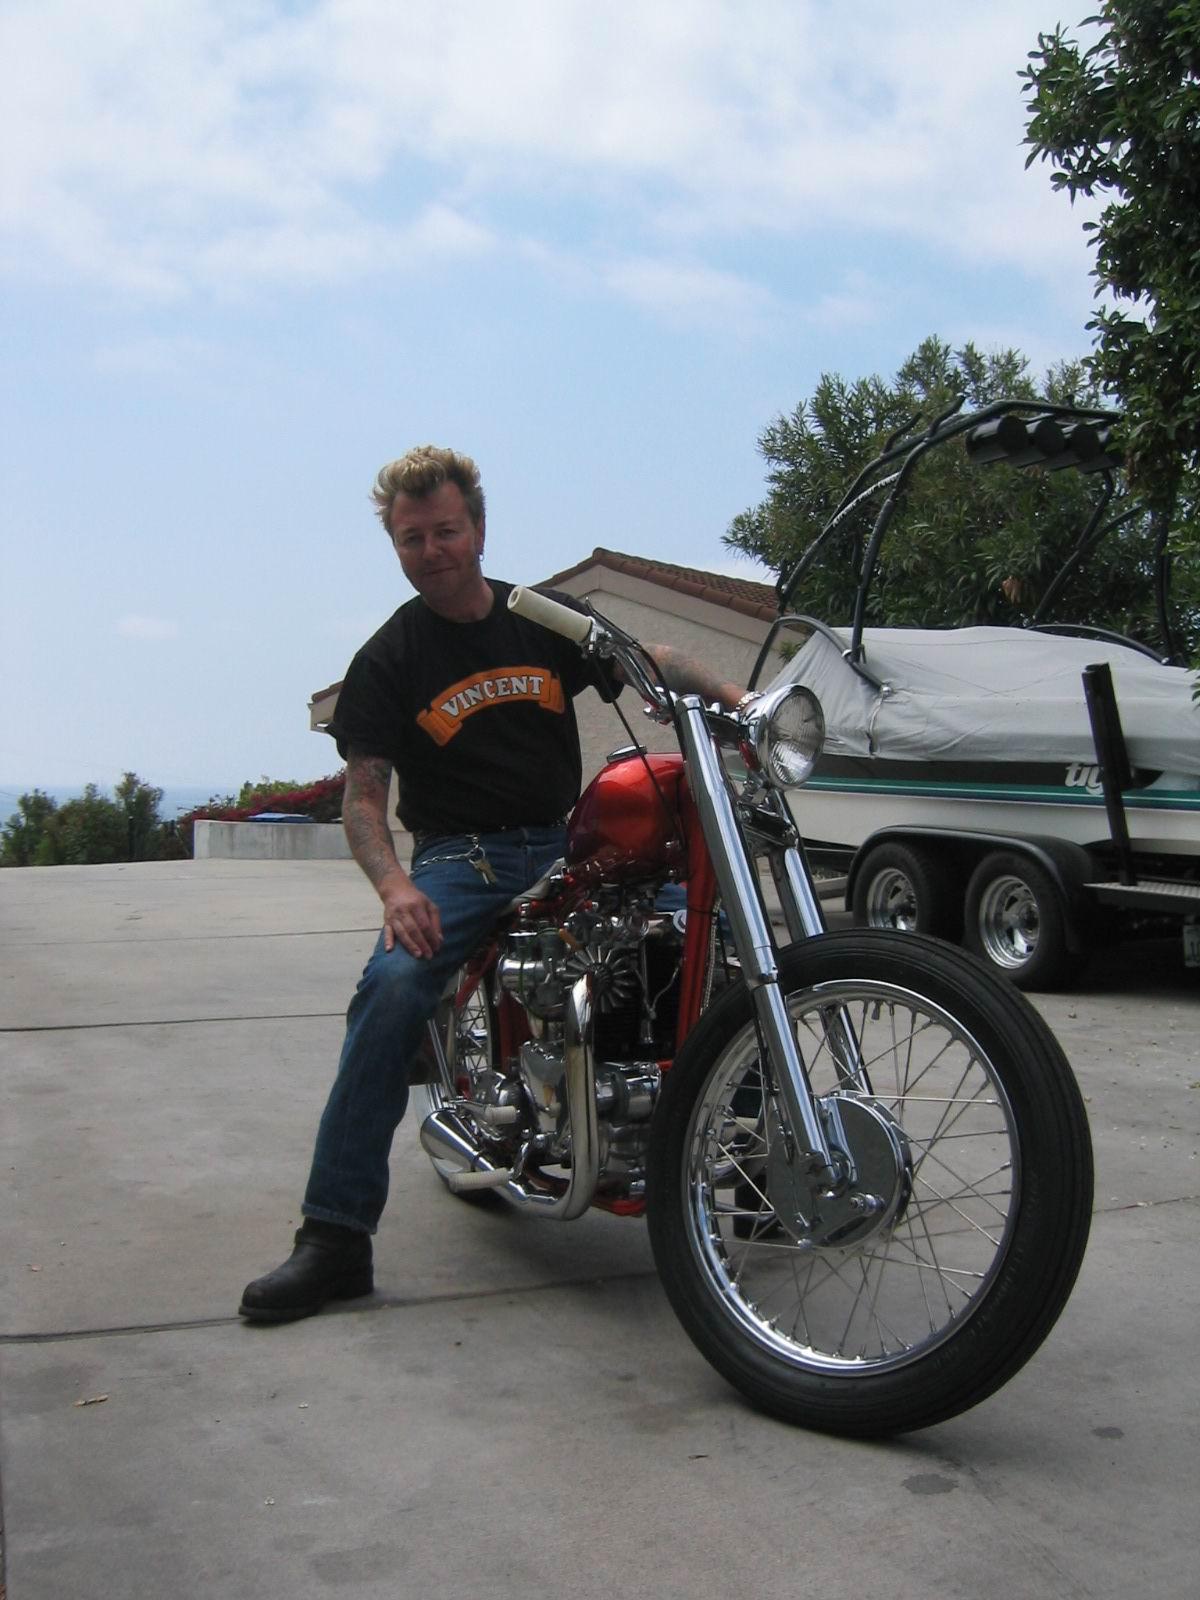 Brian Setzer S Custom Bobber Bike